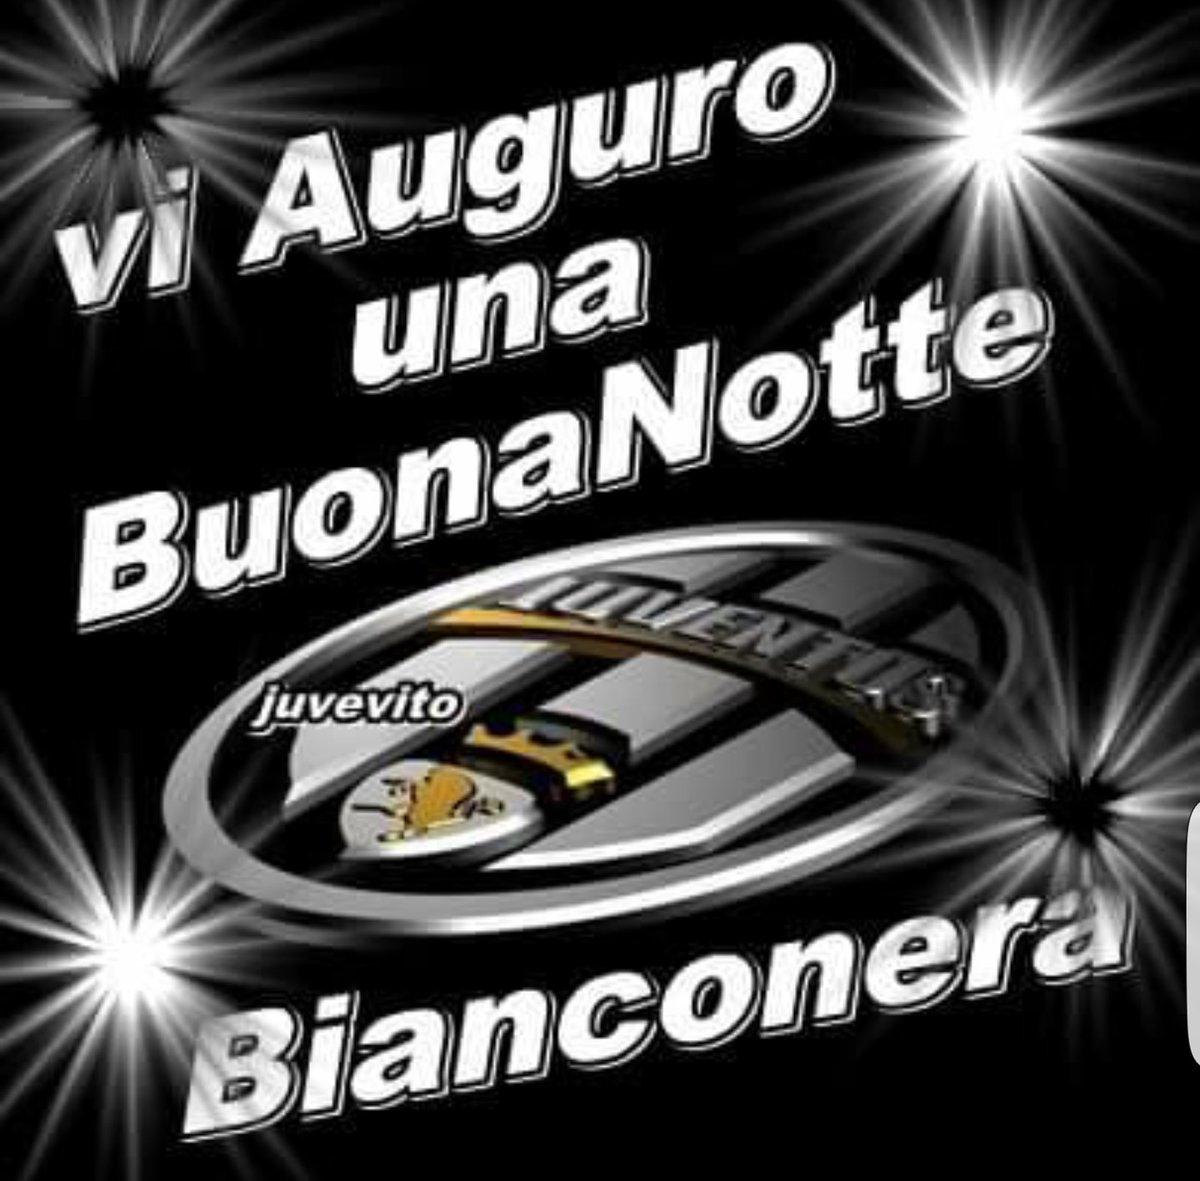 Juventusfc On Twitter Buonanotte Bianconeri